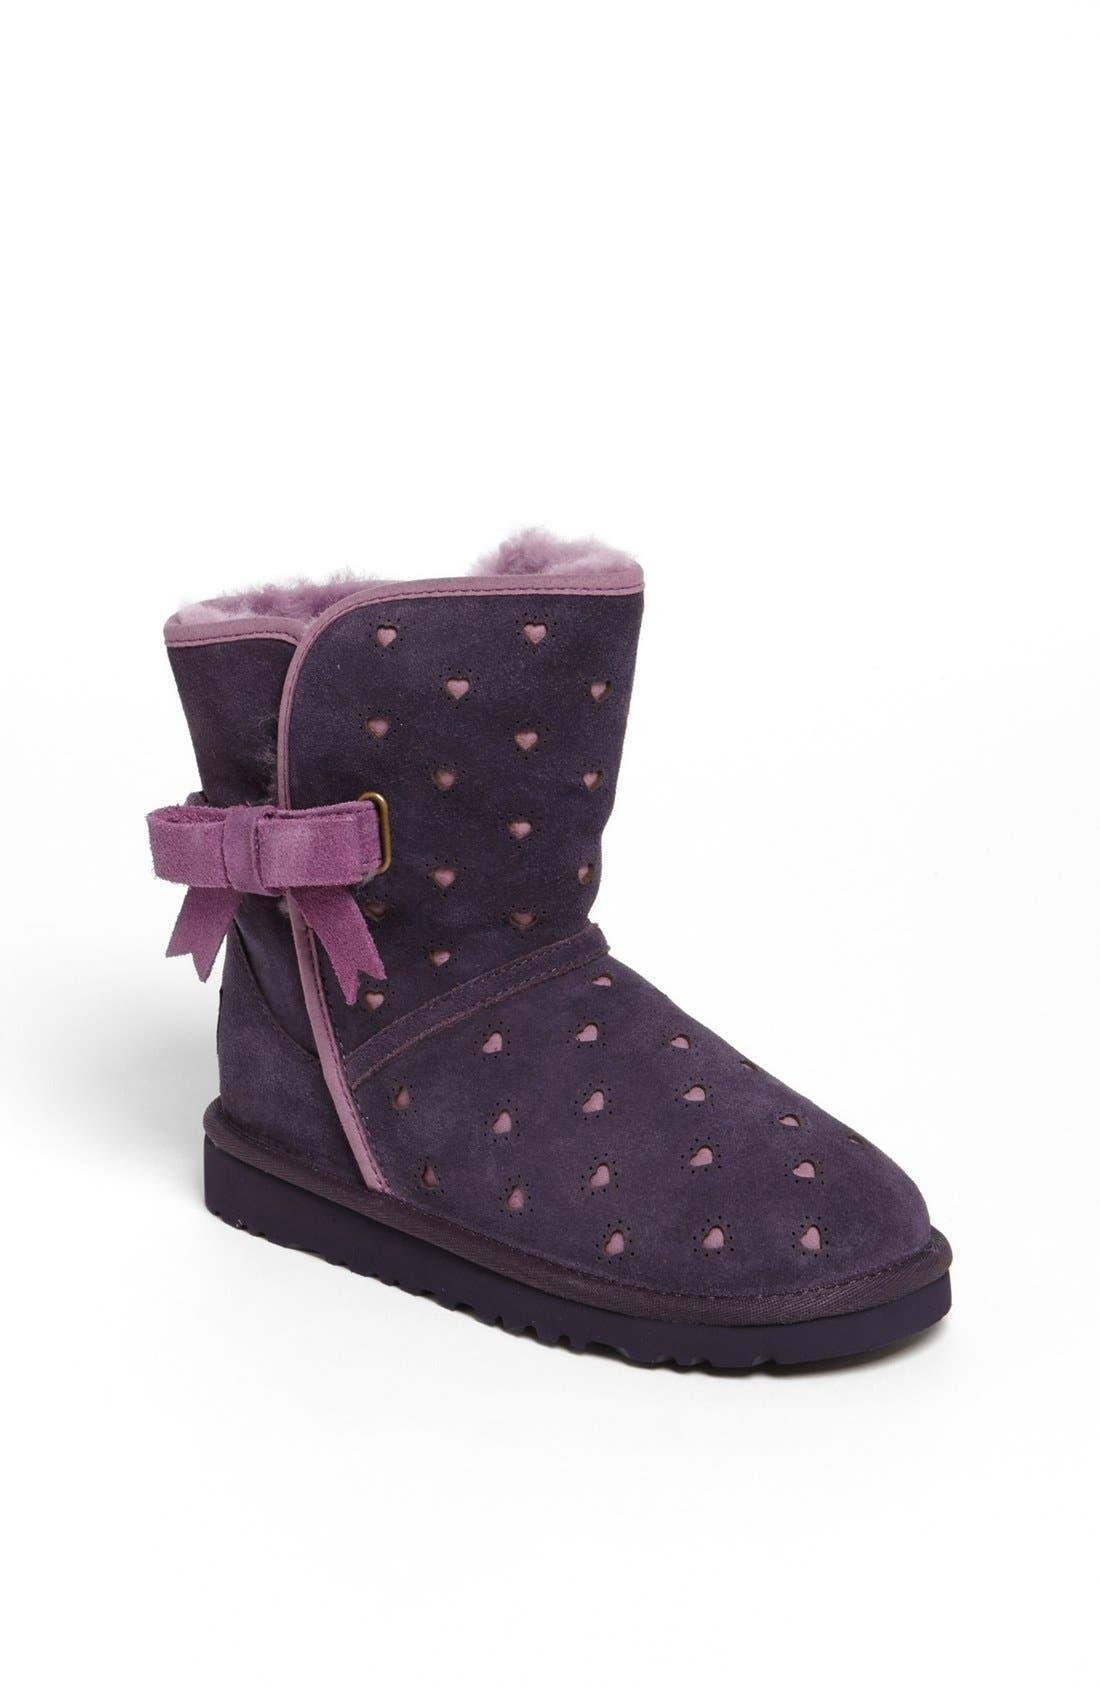 Alternate Image 1 Selected - UGG® Australia 'Joleigh' Boot (Toddler, Little Kid & Big Kid)